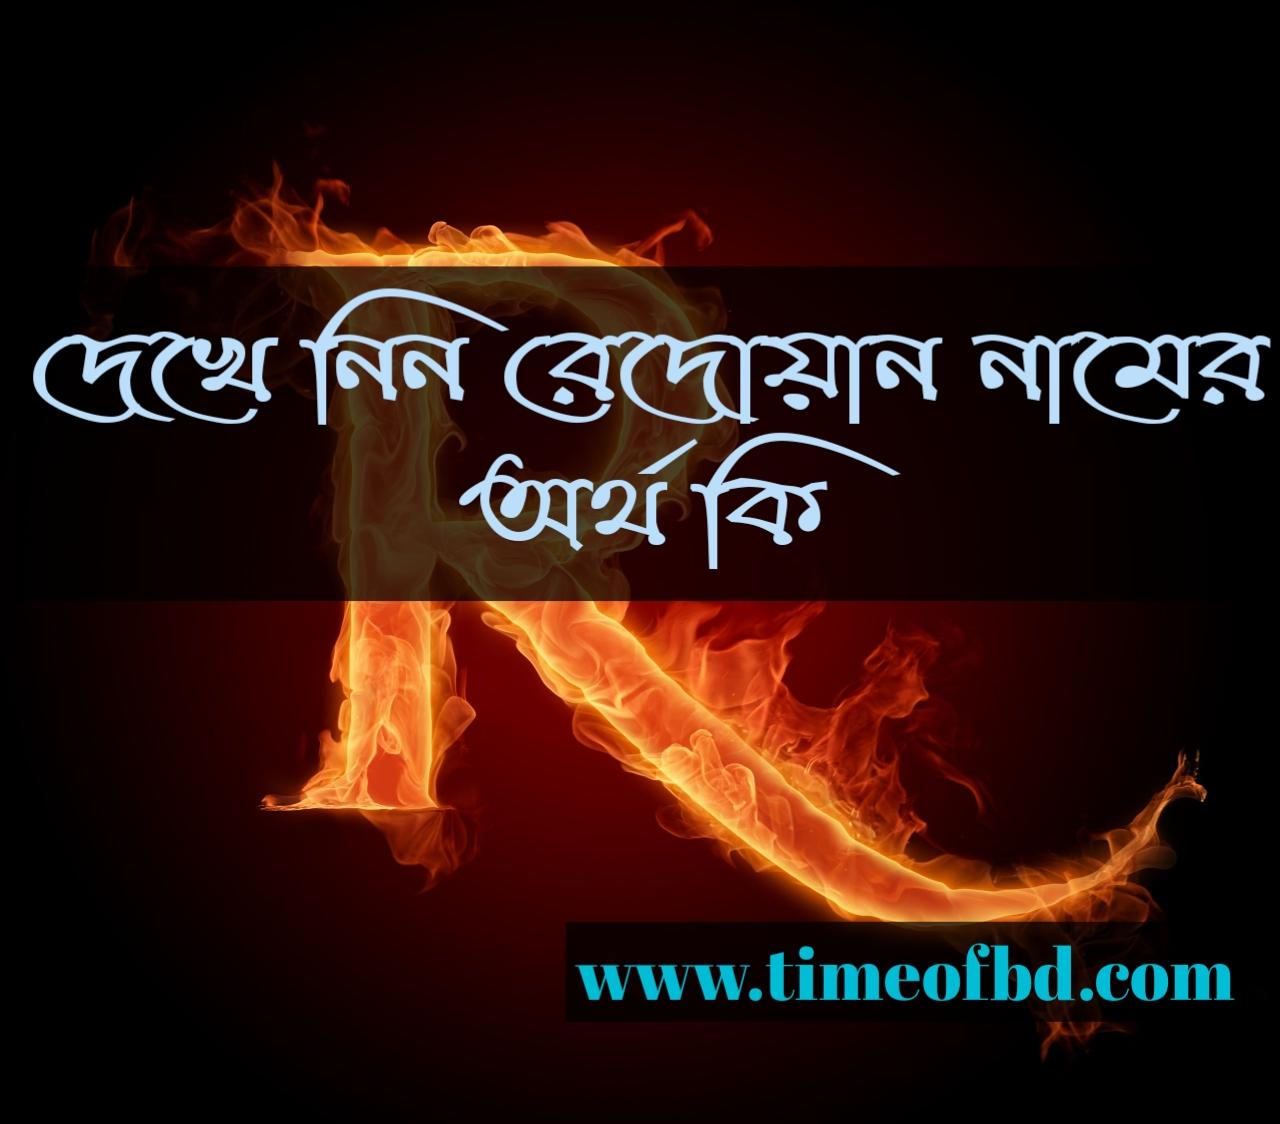 redwam name meaning in Bengali, রিদোয়ান নামের অর্থ কি, রিদোয়ান নামের বাংলা অর্থ কি, রিদোয়ান নামের ইসলামিক অর্থ কি,